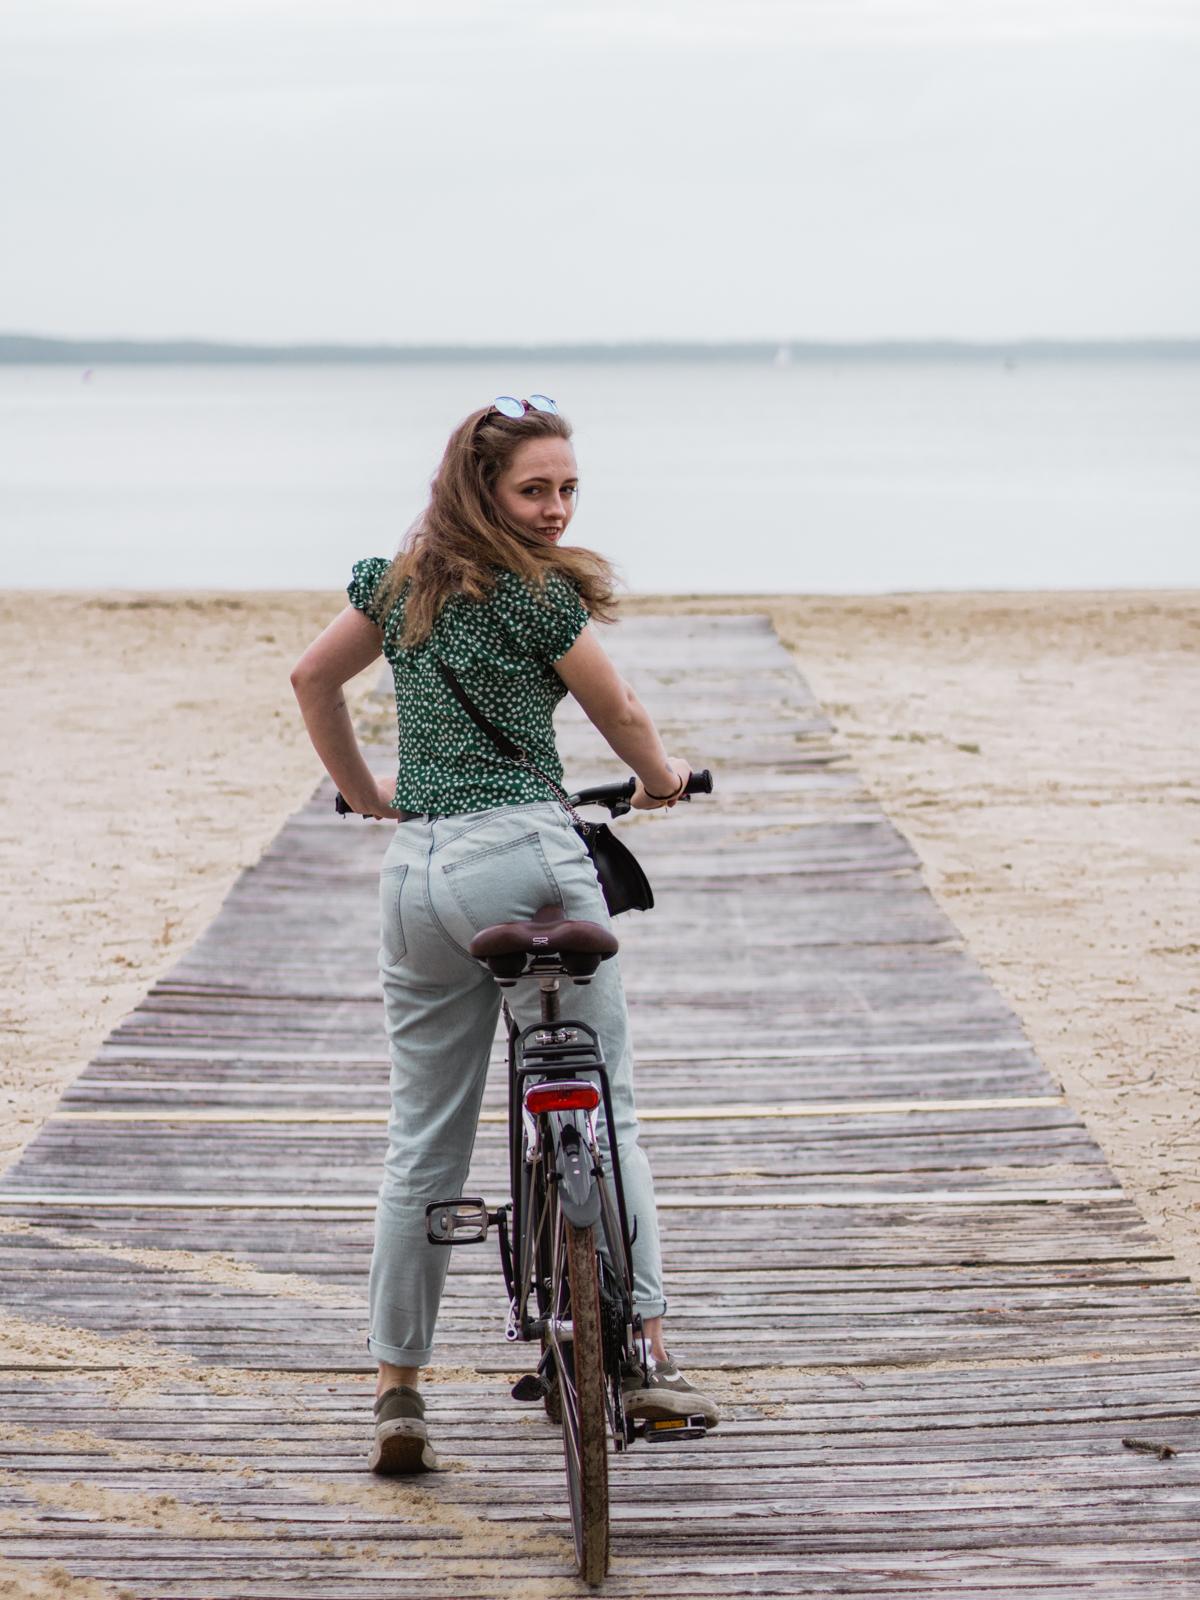 Vélo Biscarosse